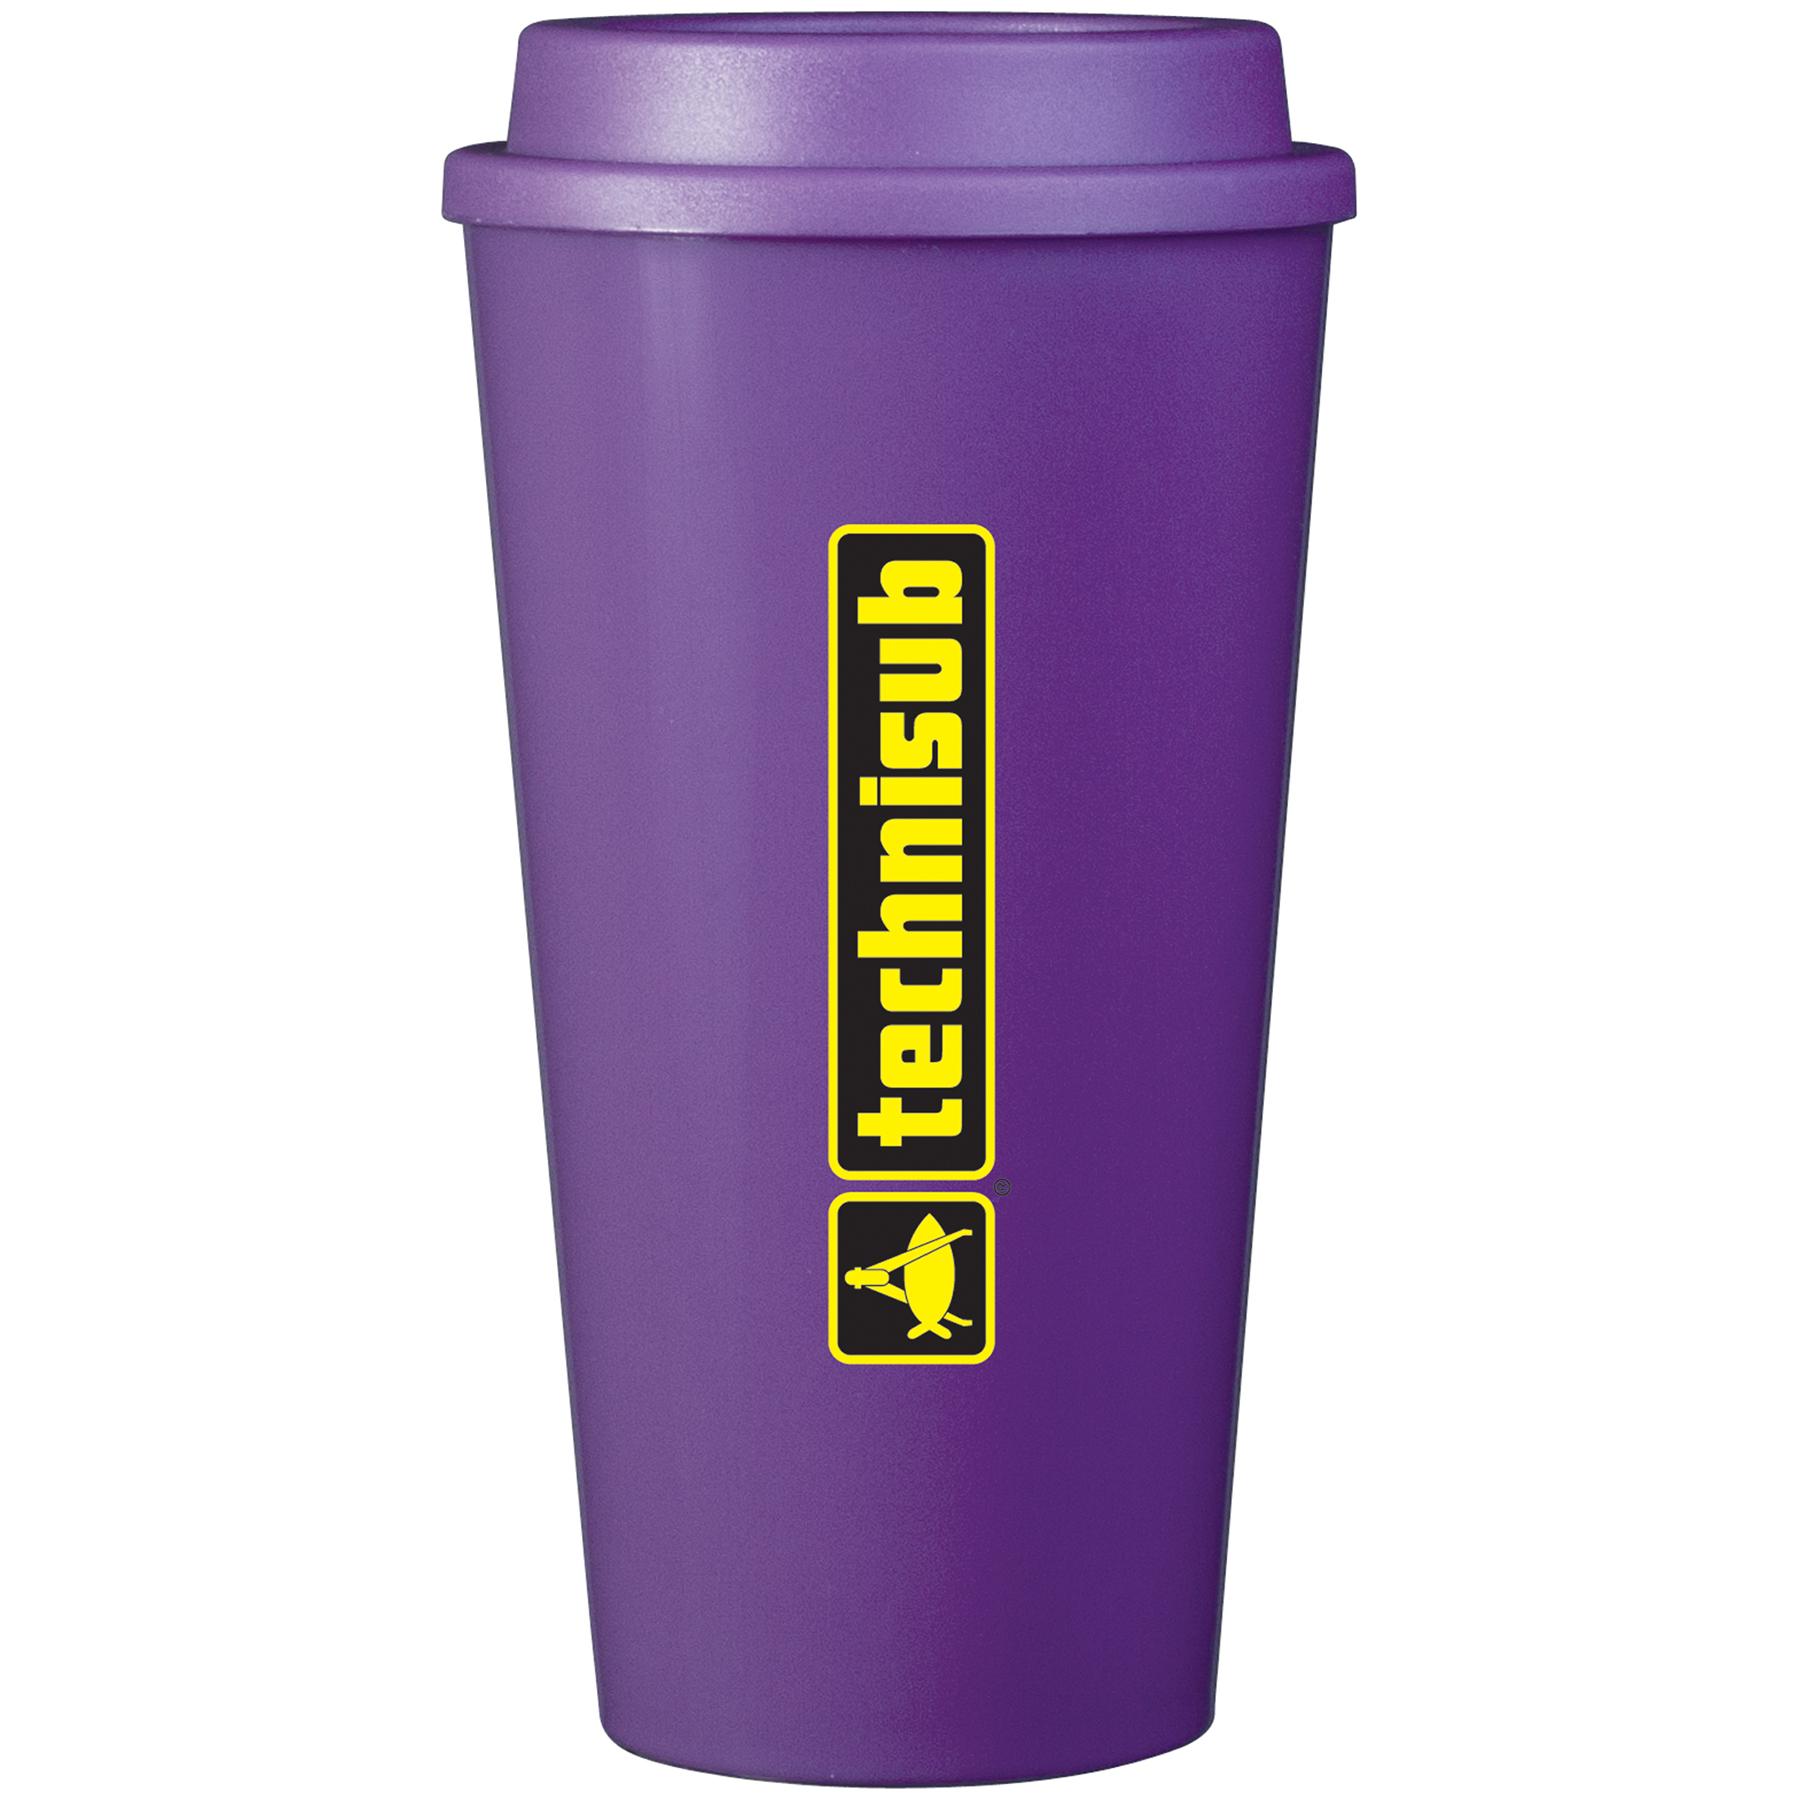 16oz Cup2go Tumbler (Purple)